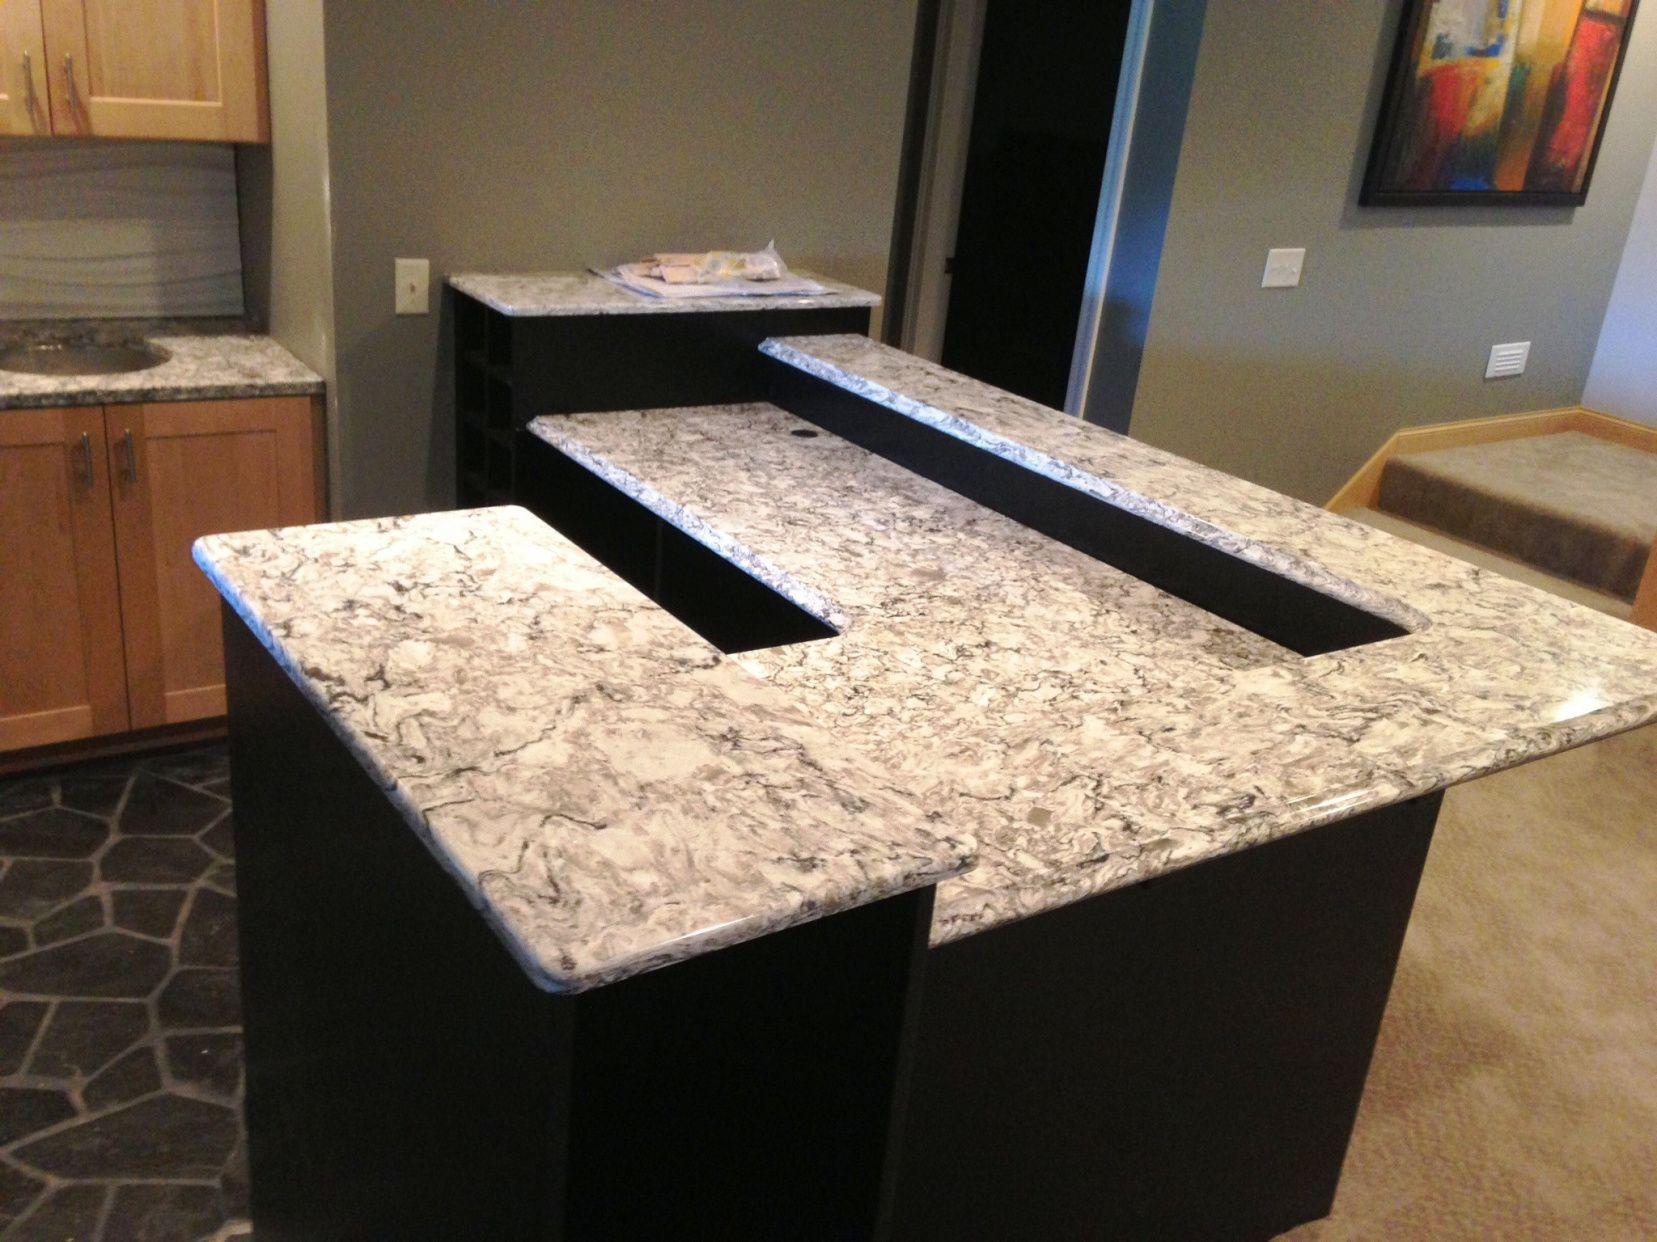 quartz countertops brands colour quartz 77 best quartz countertops brands kitchen cabinets storage ideas check more at http